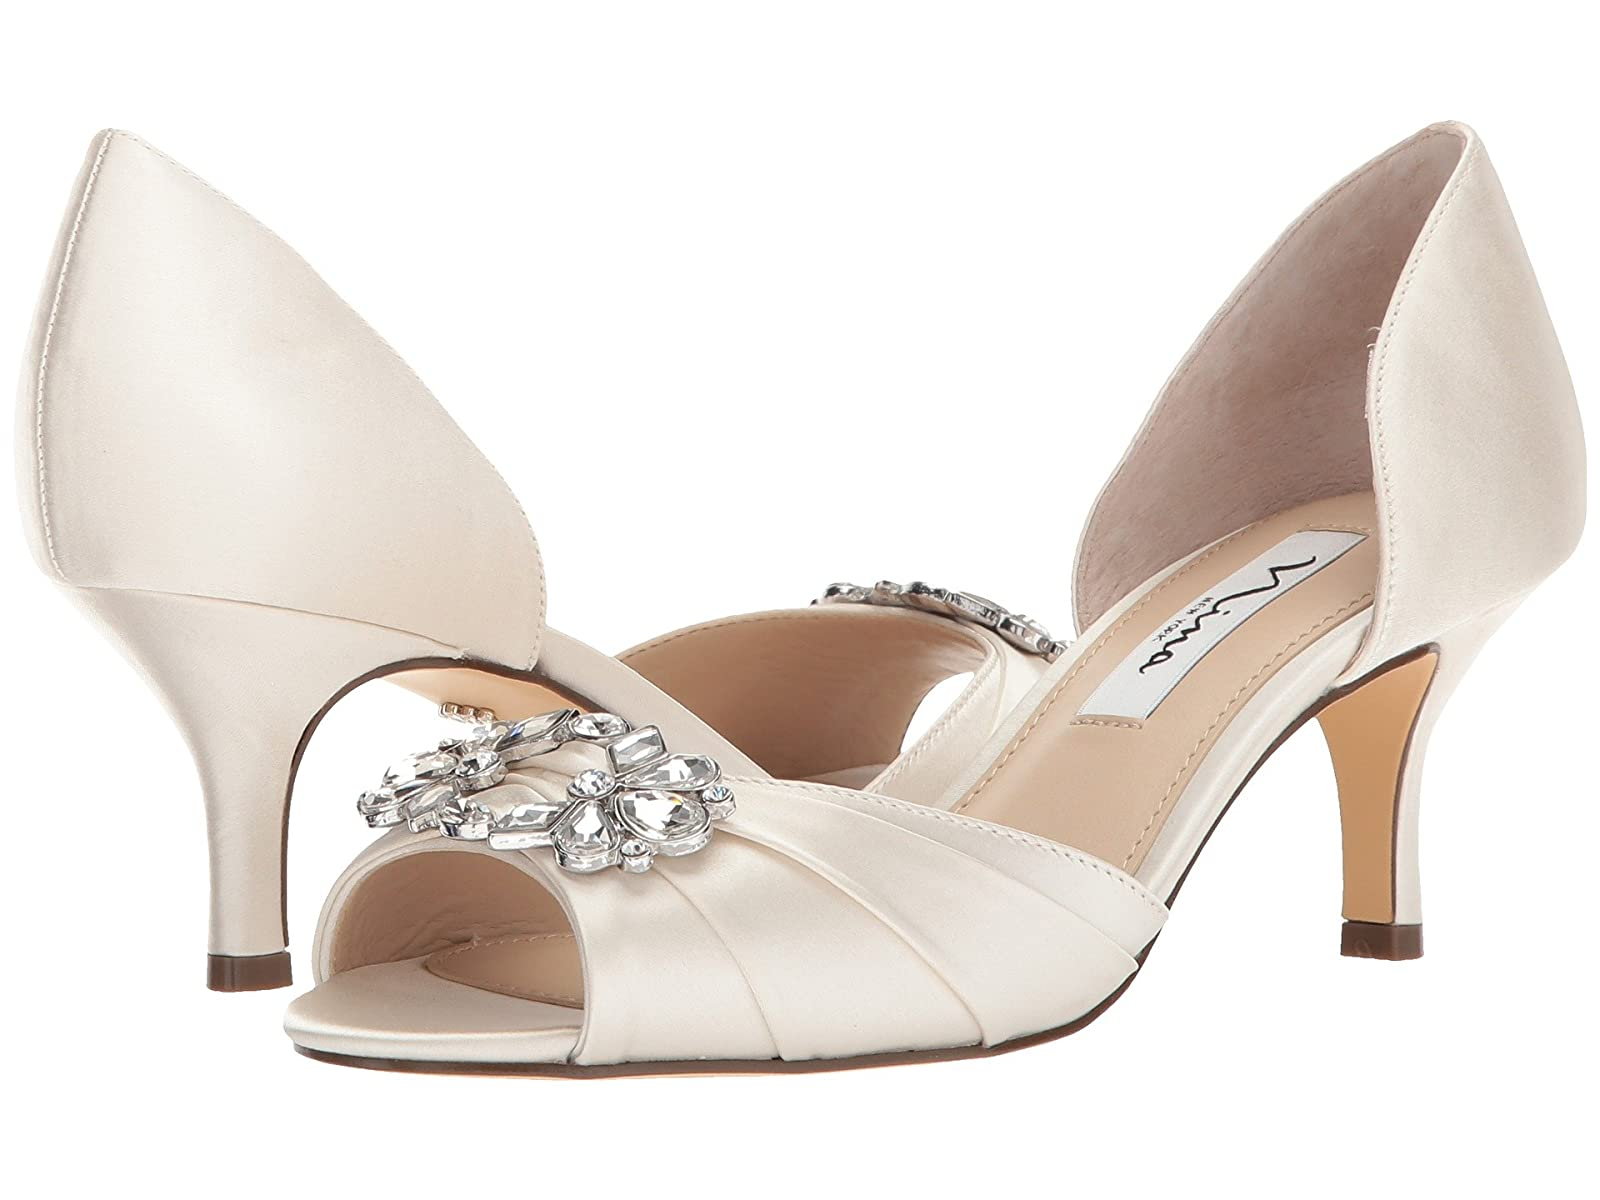 Nina CharisaAtmospheric grades have affordable shoes